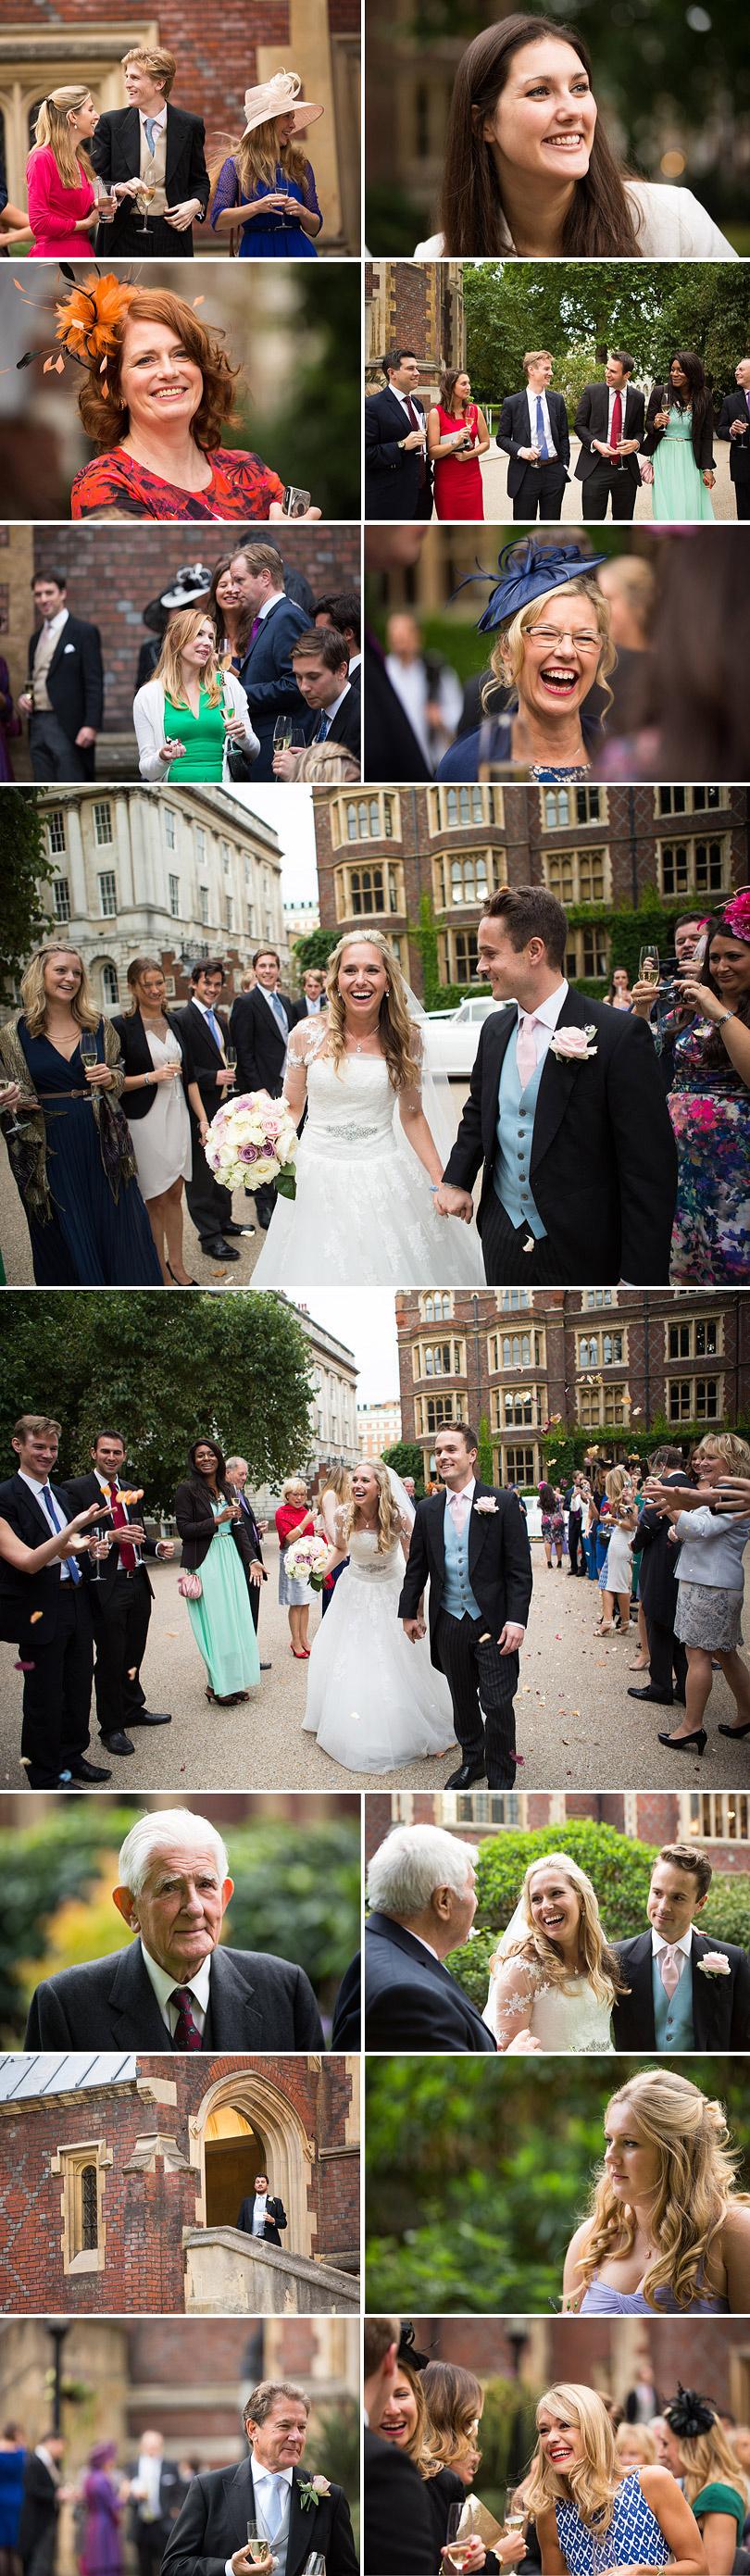 Brompton-Oratory-Lincolns-Inn-Wedding-RachelMax-015.jpg